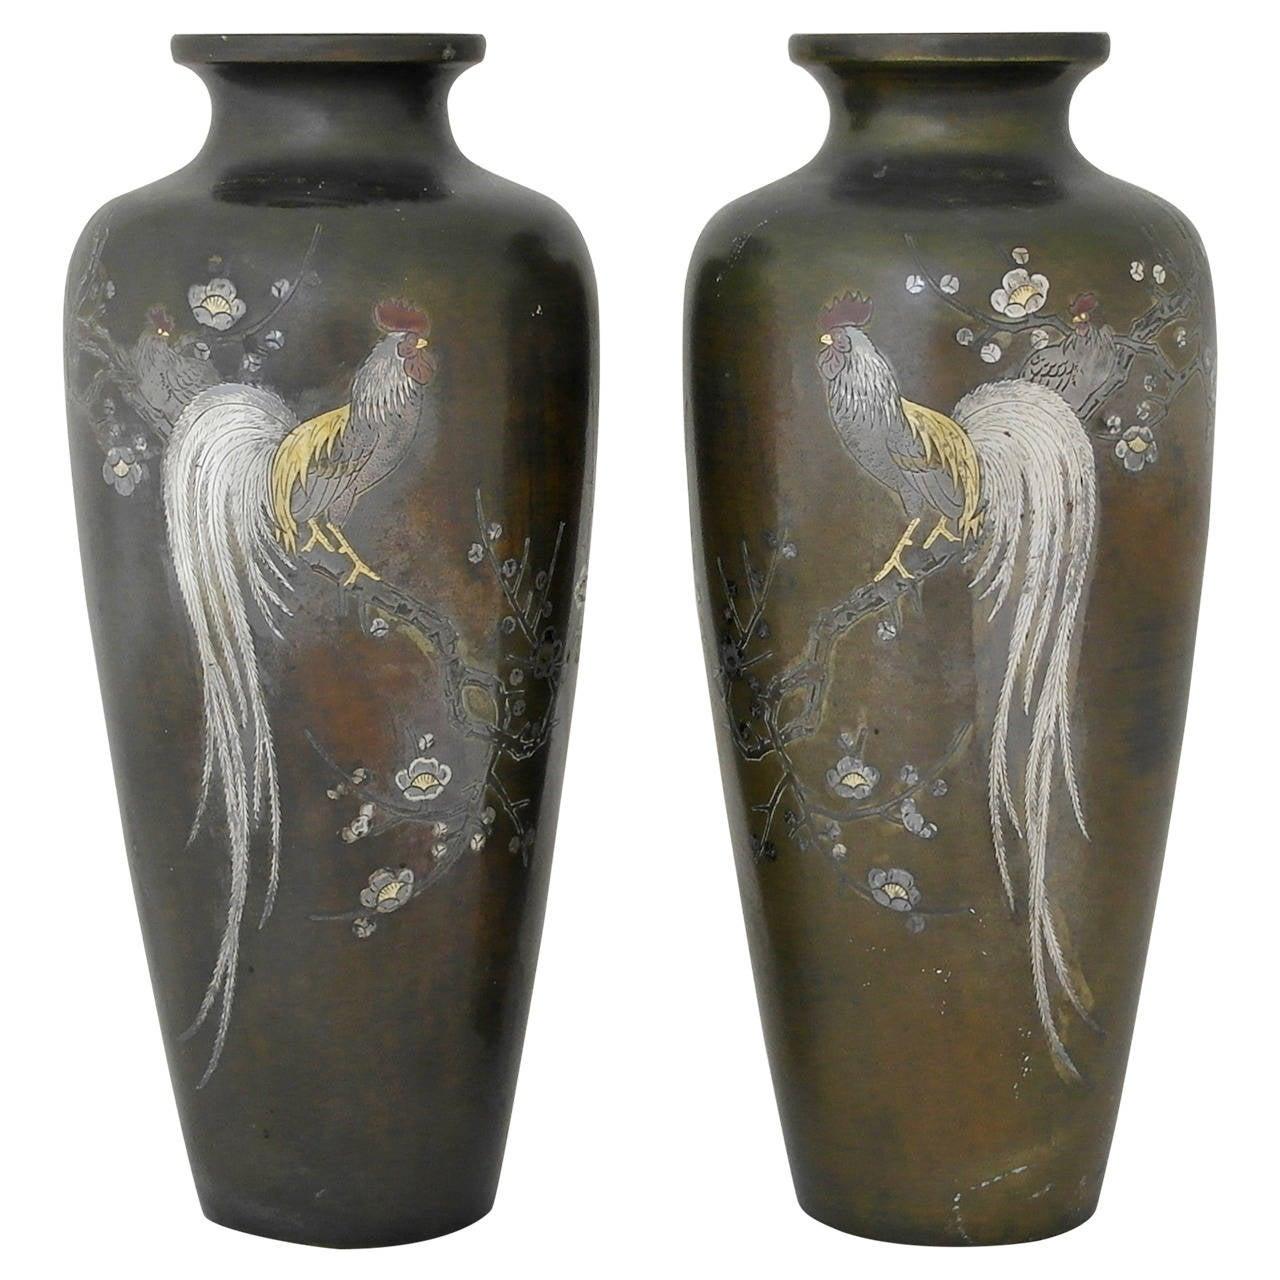 Superbgreat patina meiji period pair of japanese bronze mixed superbgreat patina meiji period pair of japanese bronze mixed metal vases 1912 for reviewsmspy